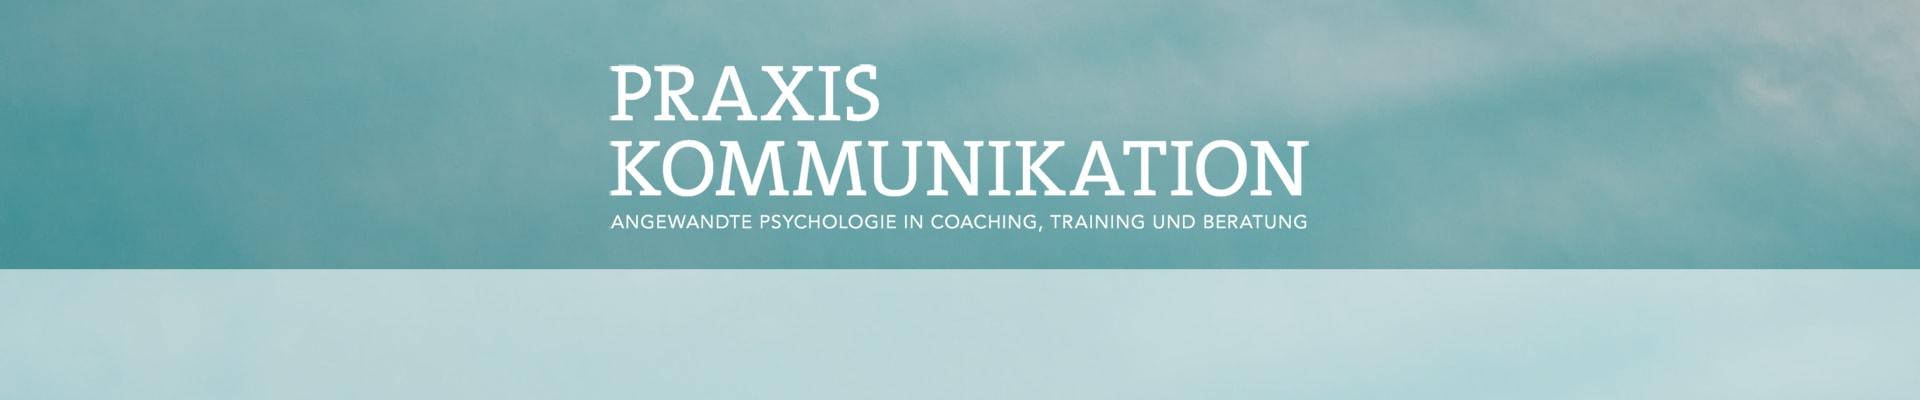 Praxis Kommunikation